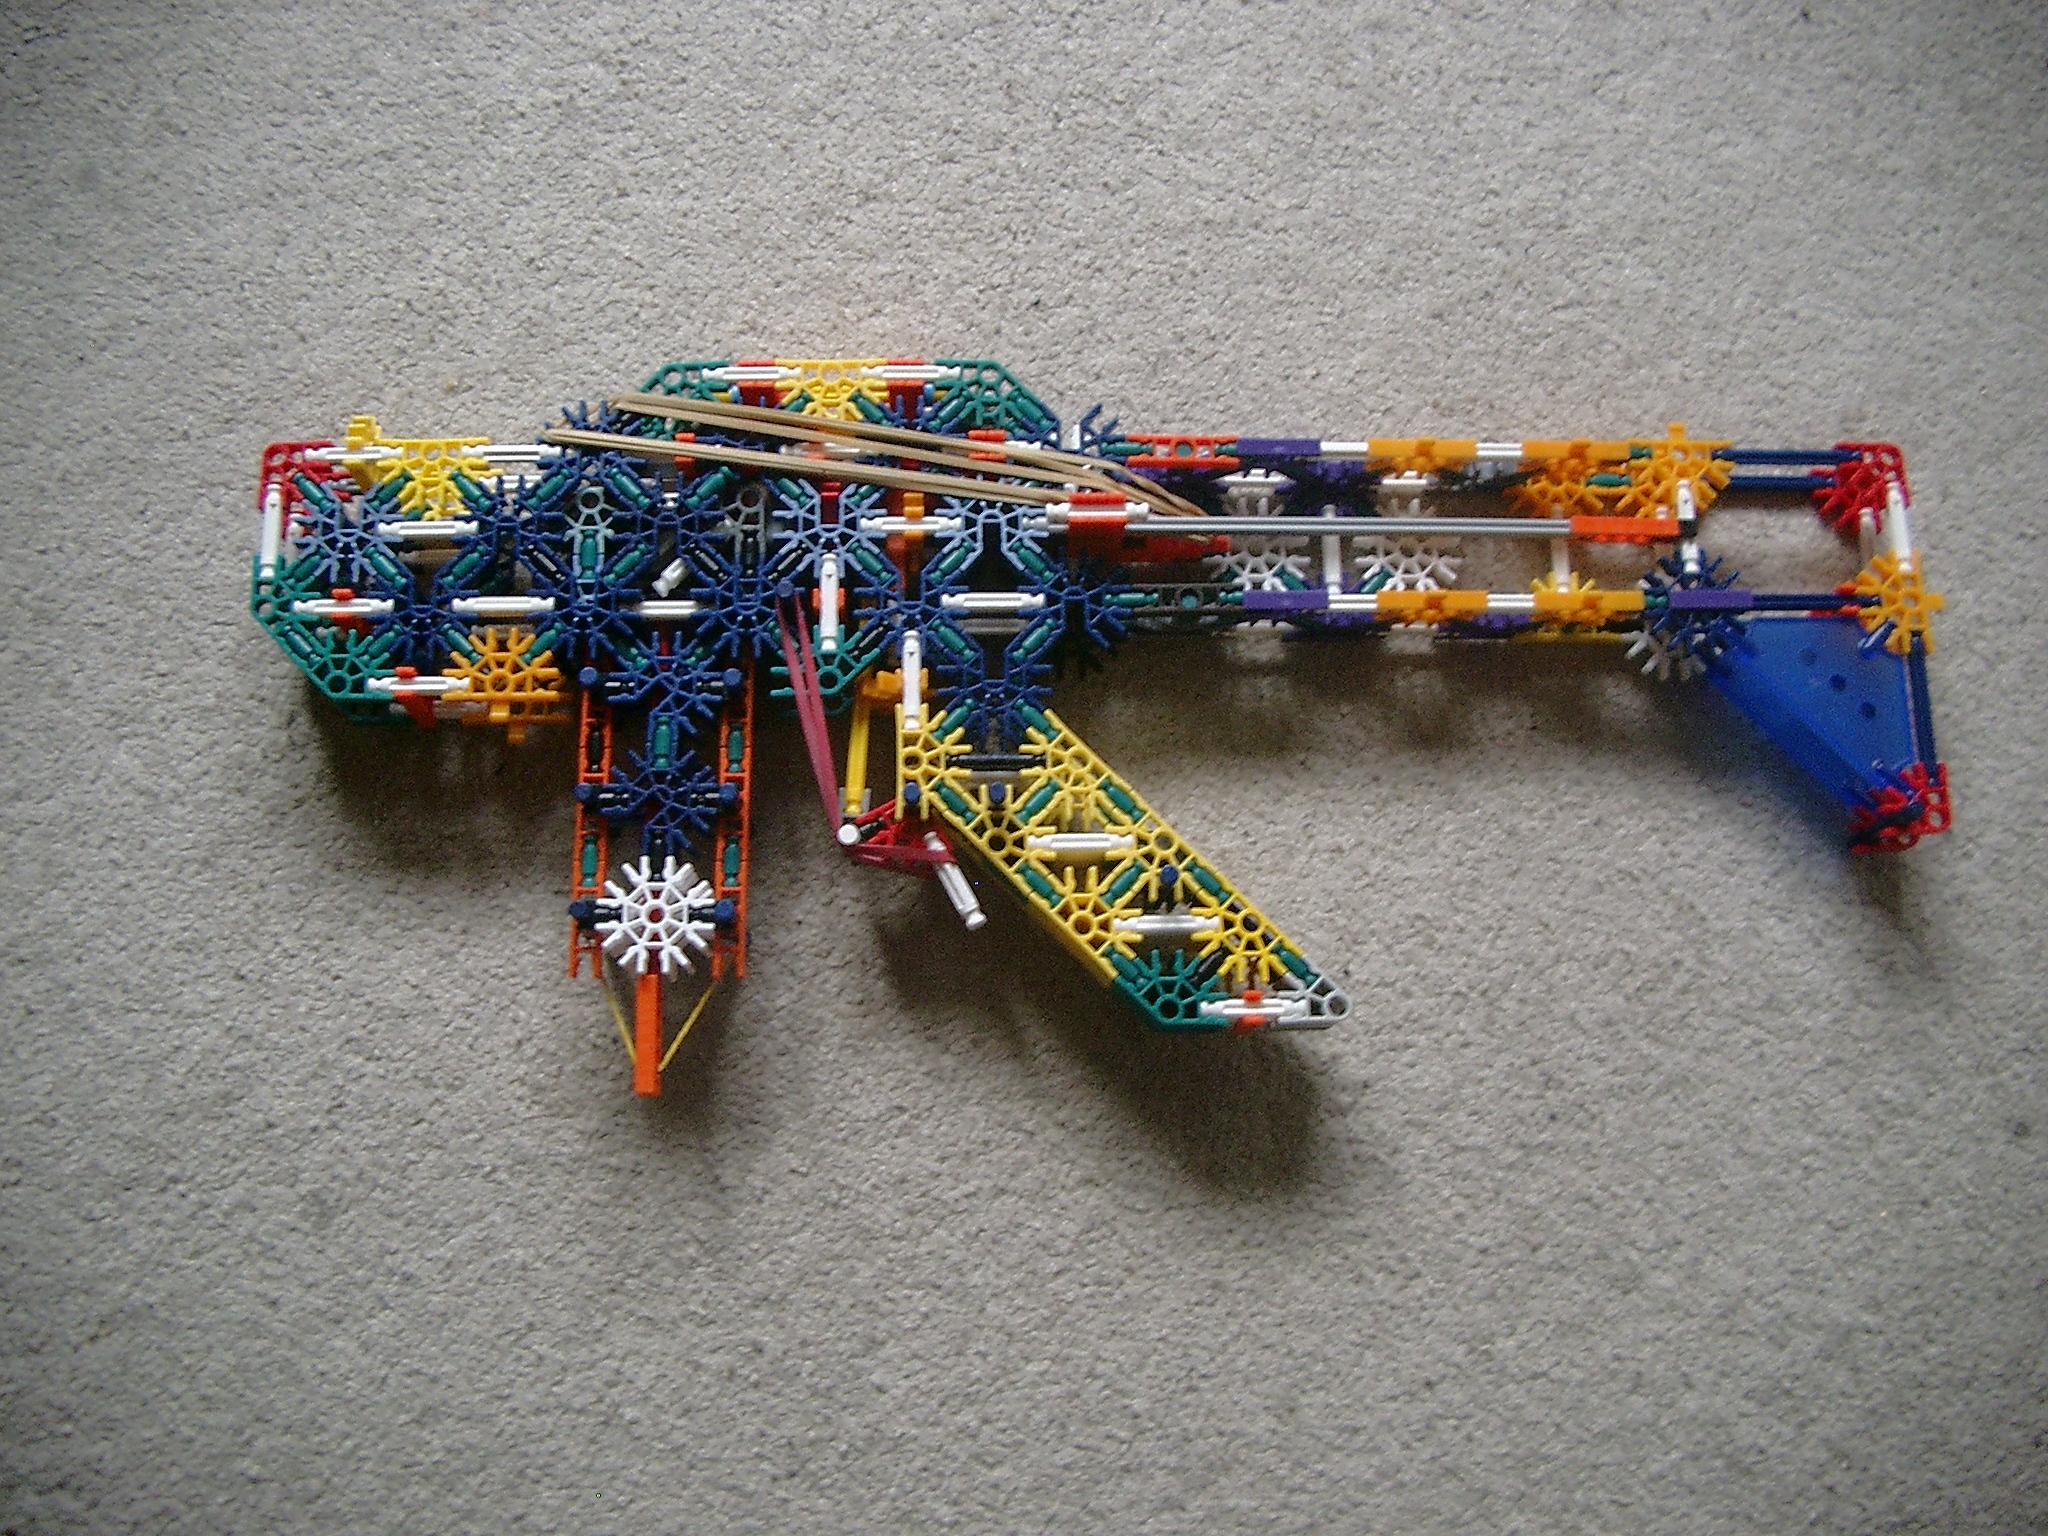 TJ-ASTR - The Jamalam's Assault rifle